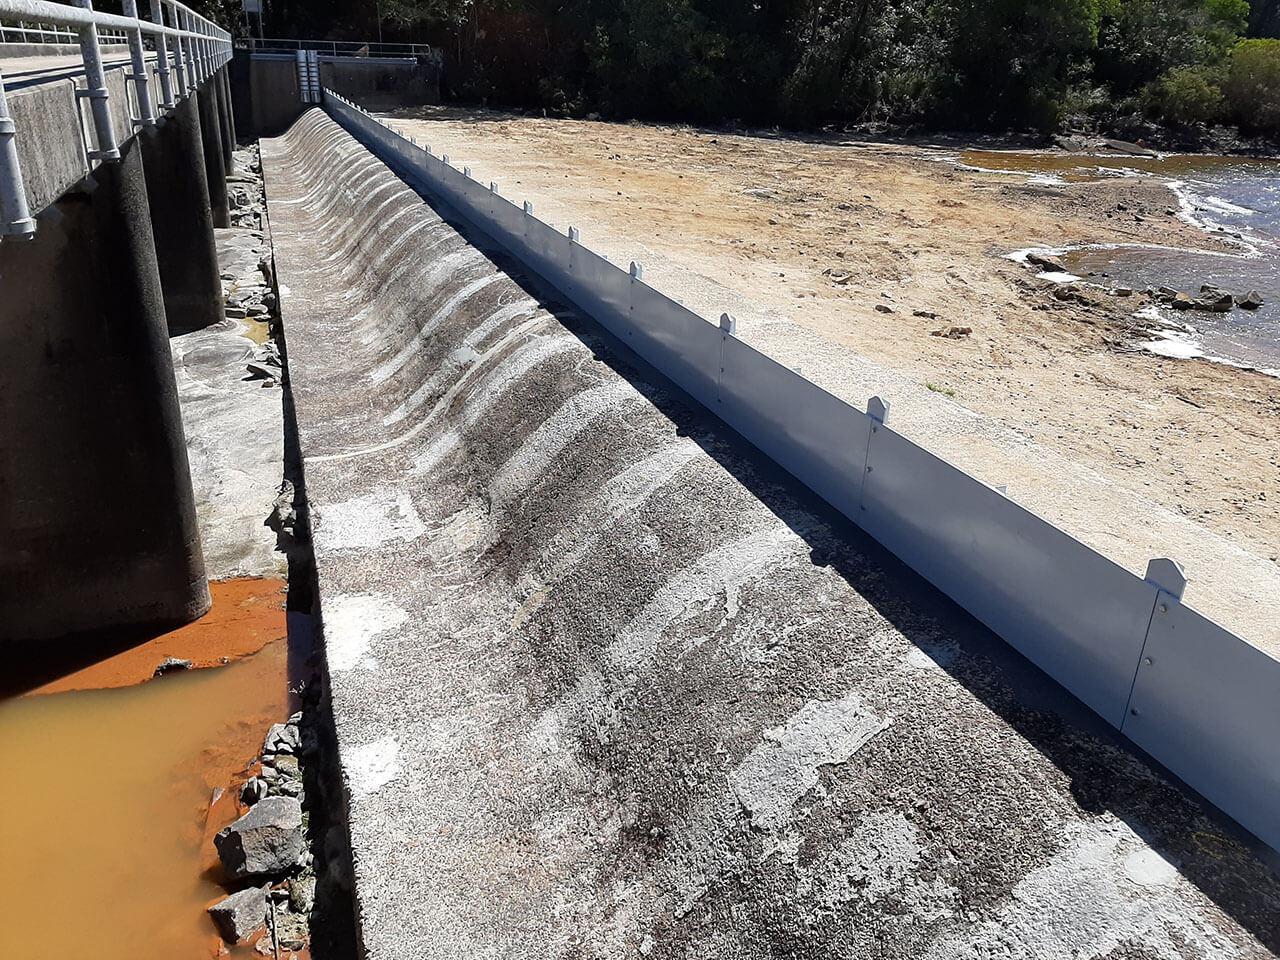 Paluma Dam - Upgrade spillway with new flashboards (2020)